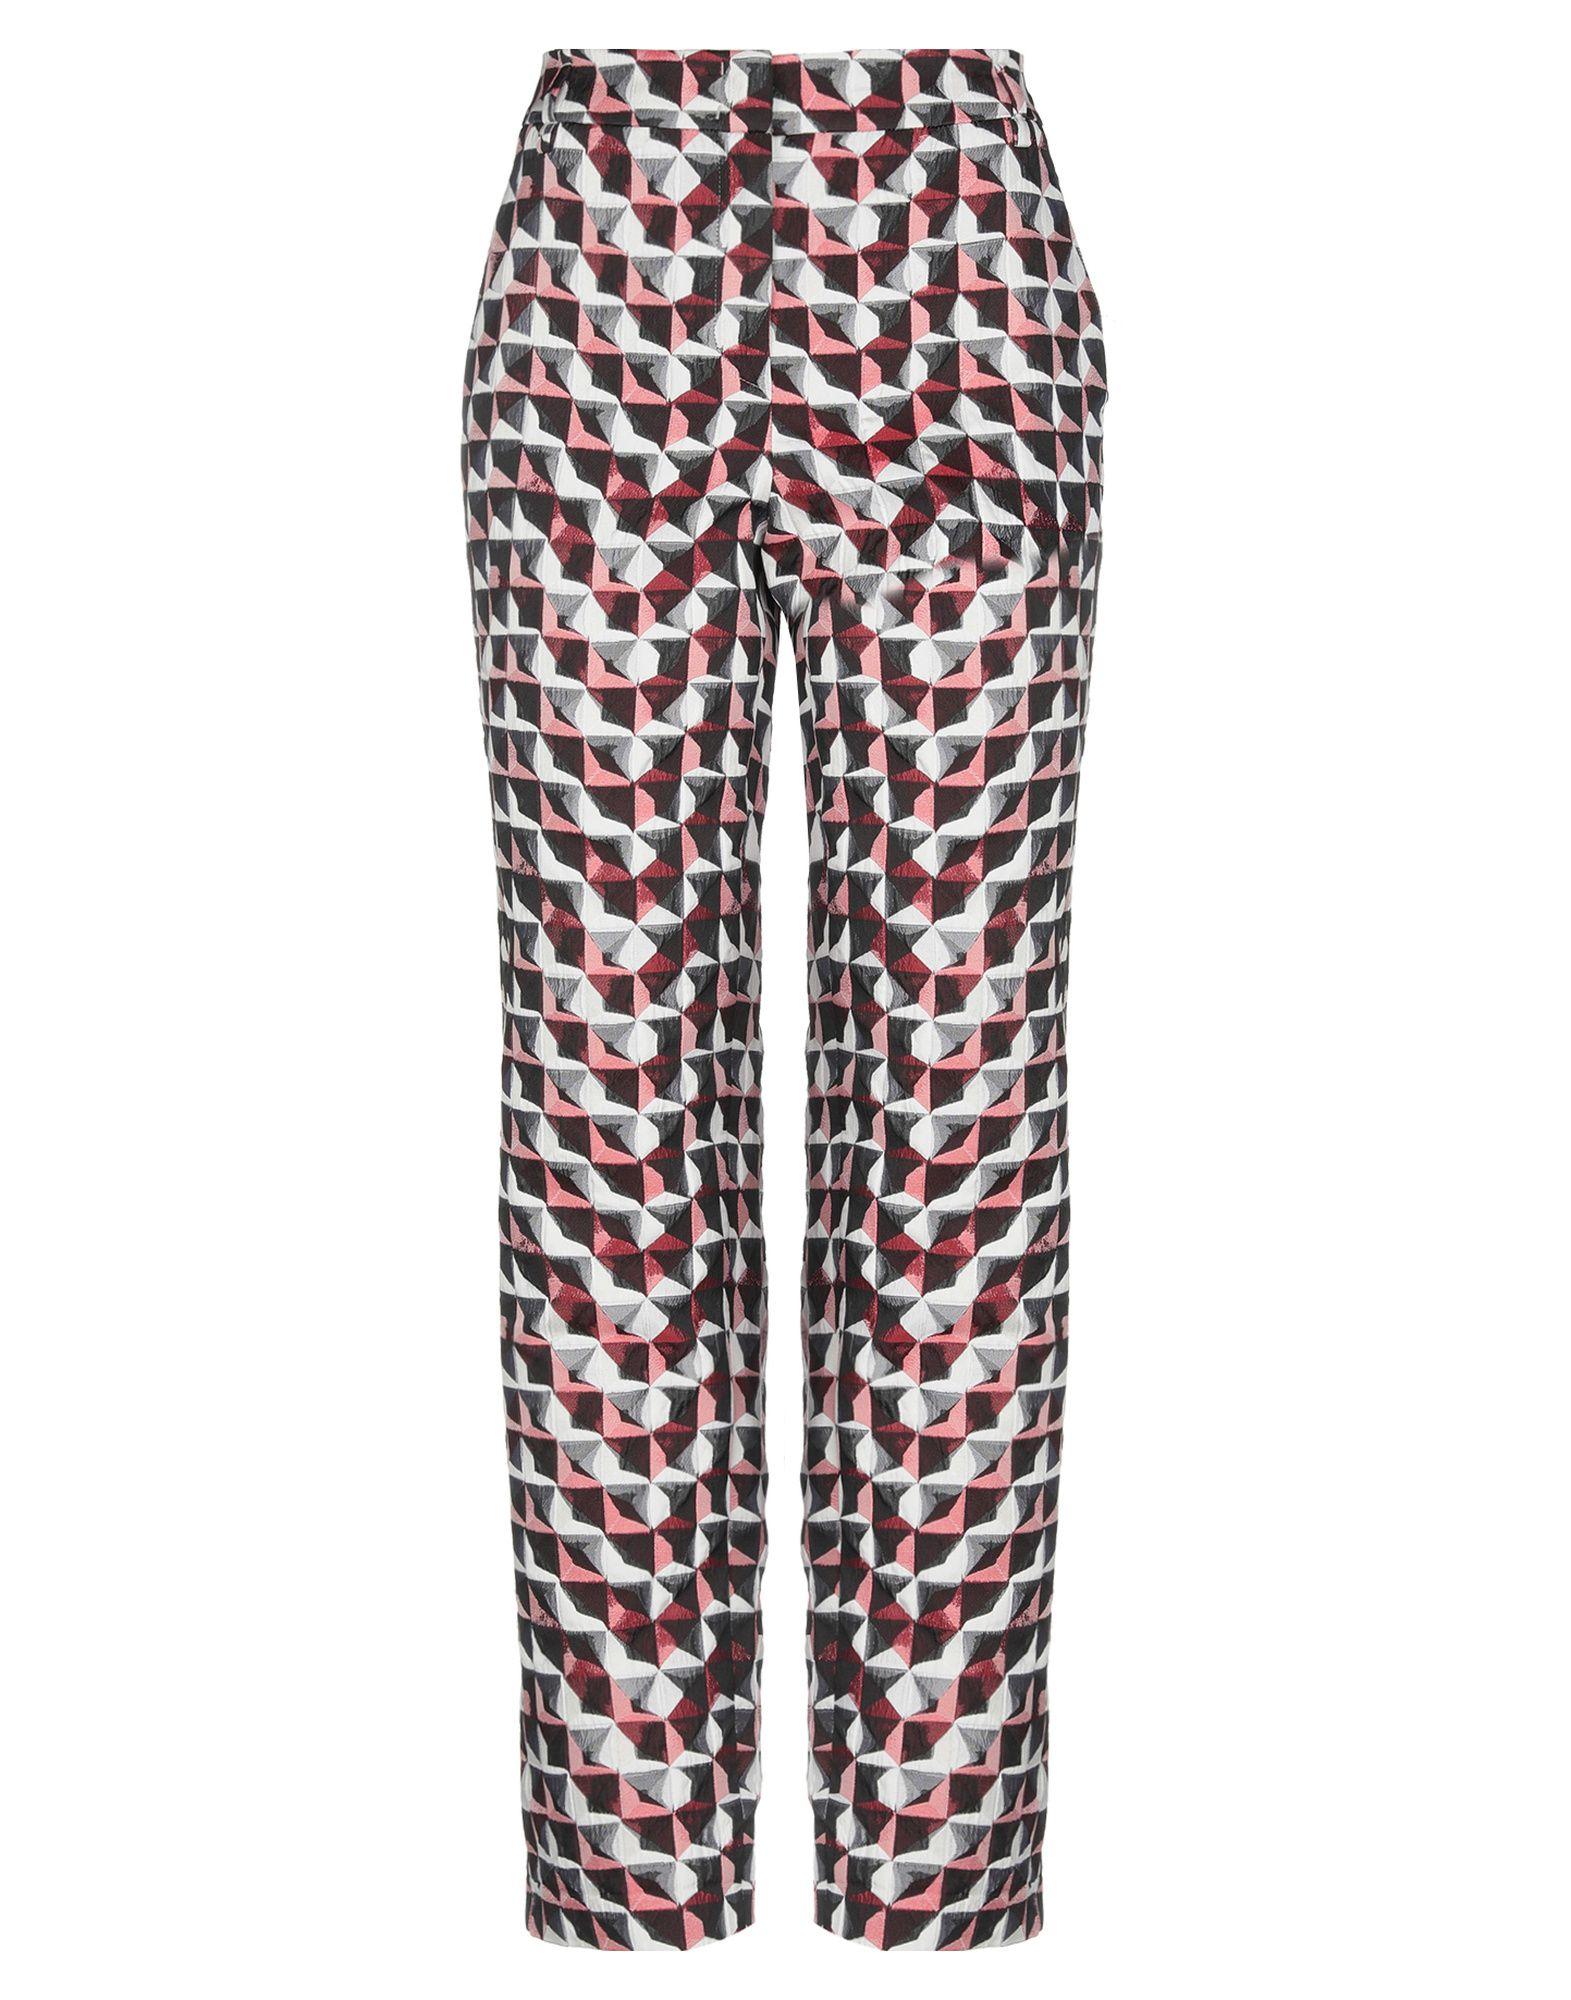 Pantalone Pantalone Pantalone Emporio Armani donna - 13303649RF a37